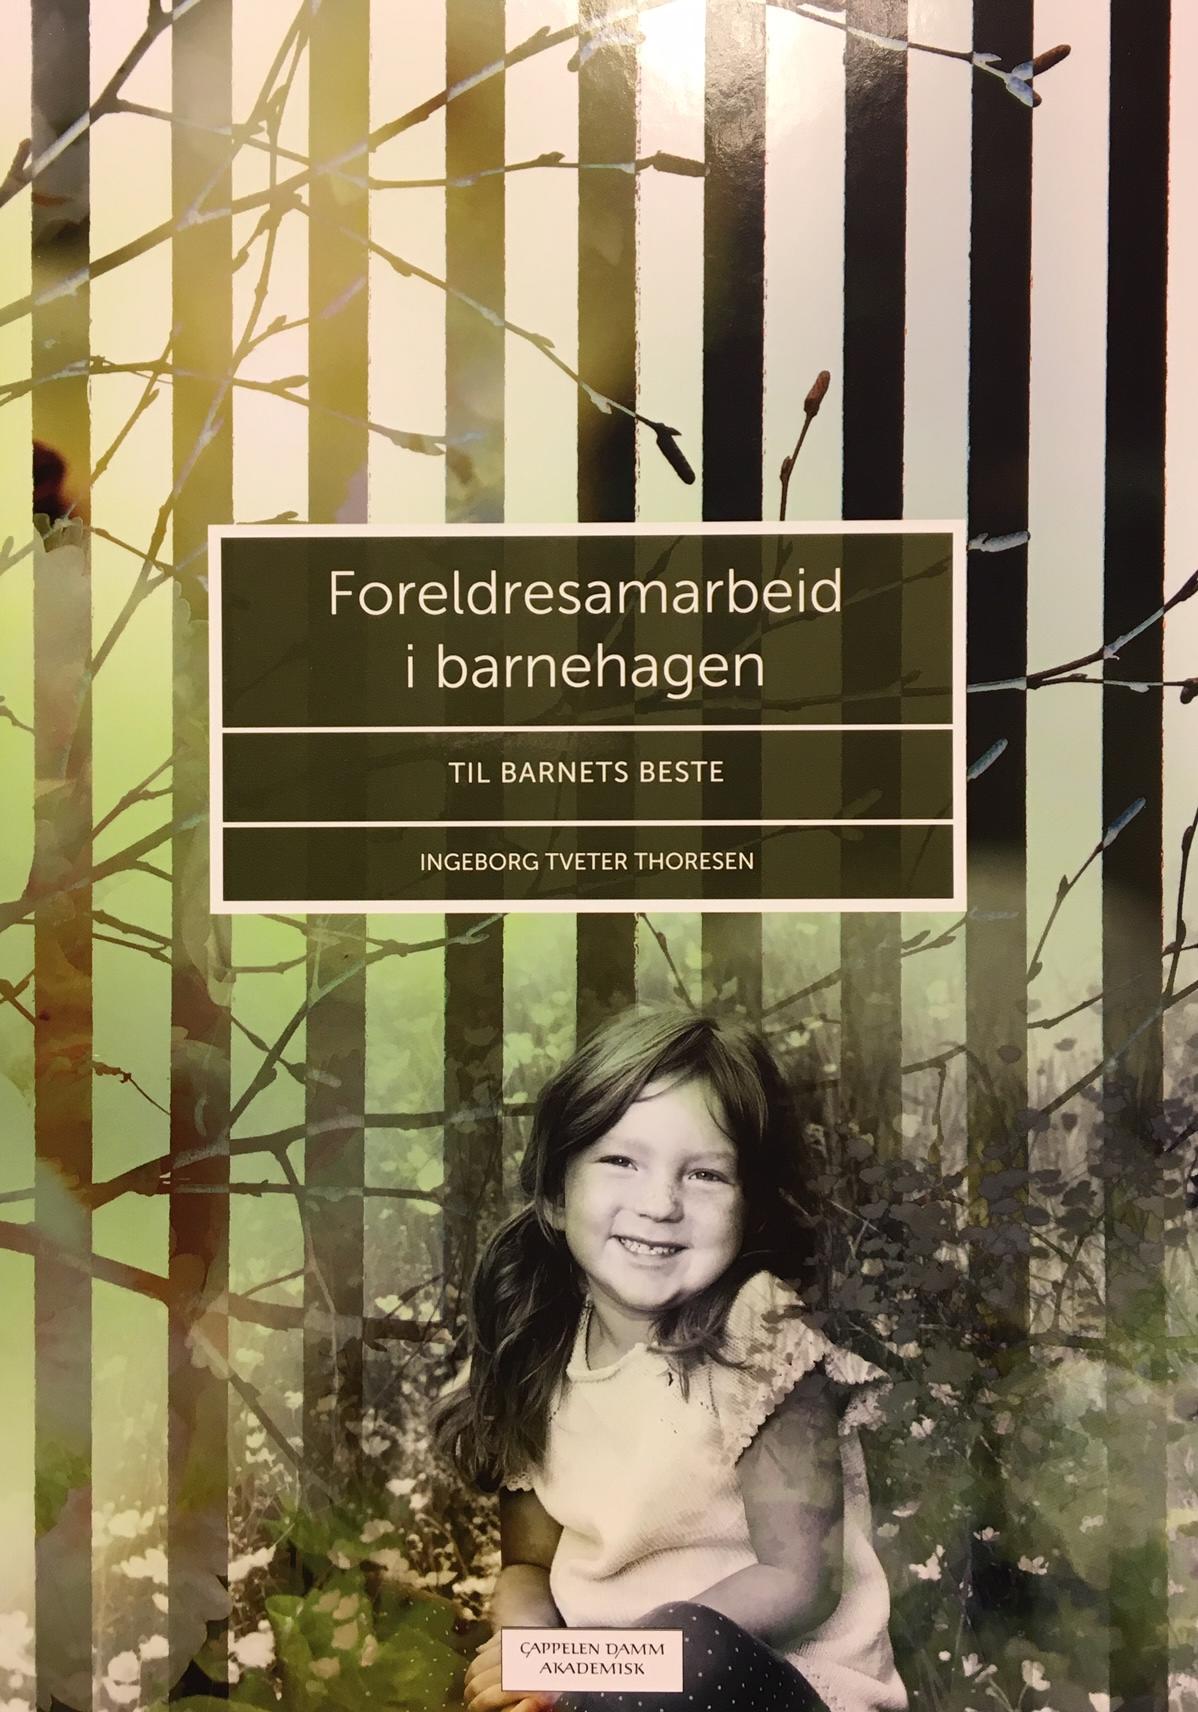 55ff89ab SMEDHUSÅSEN BARNEHAGE SA